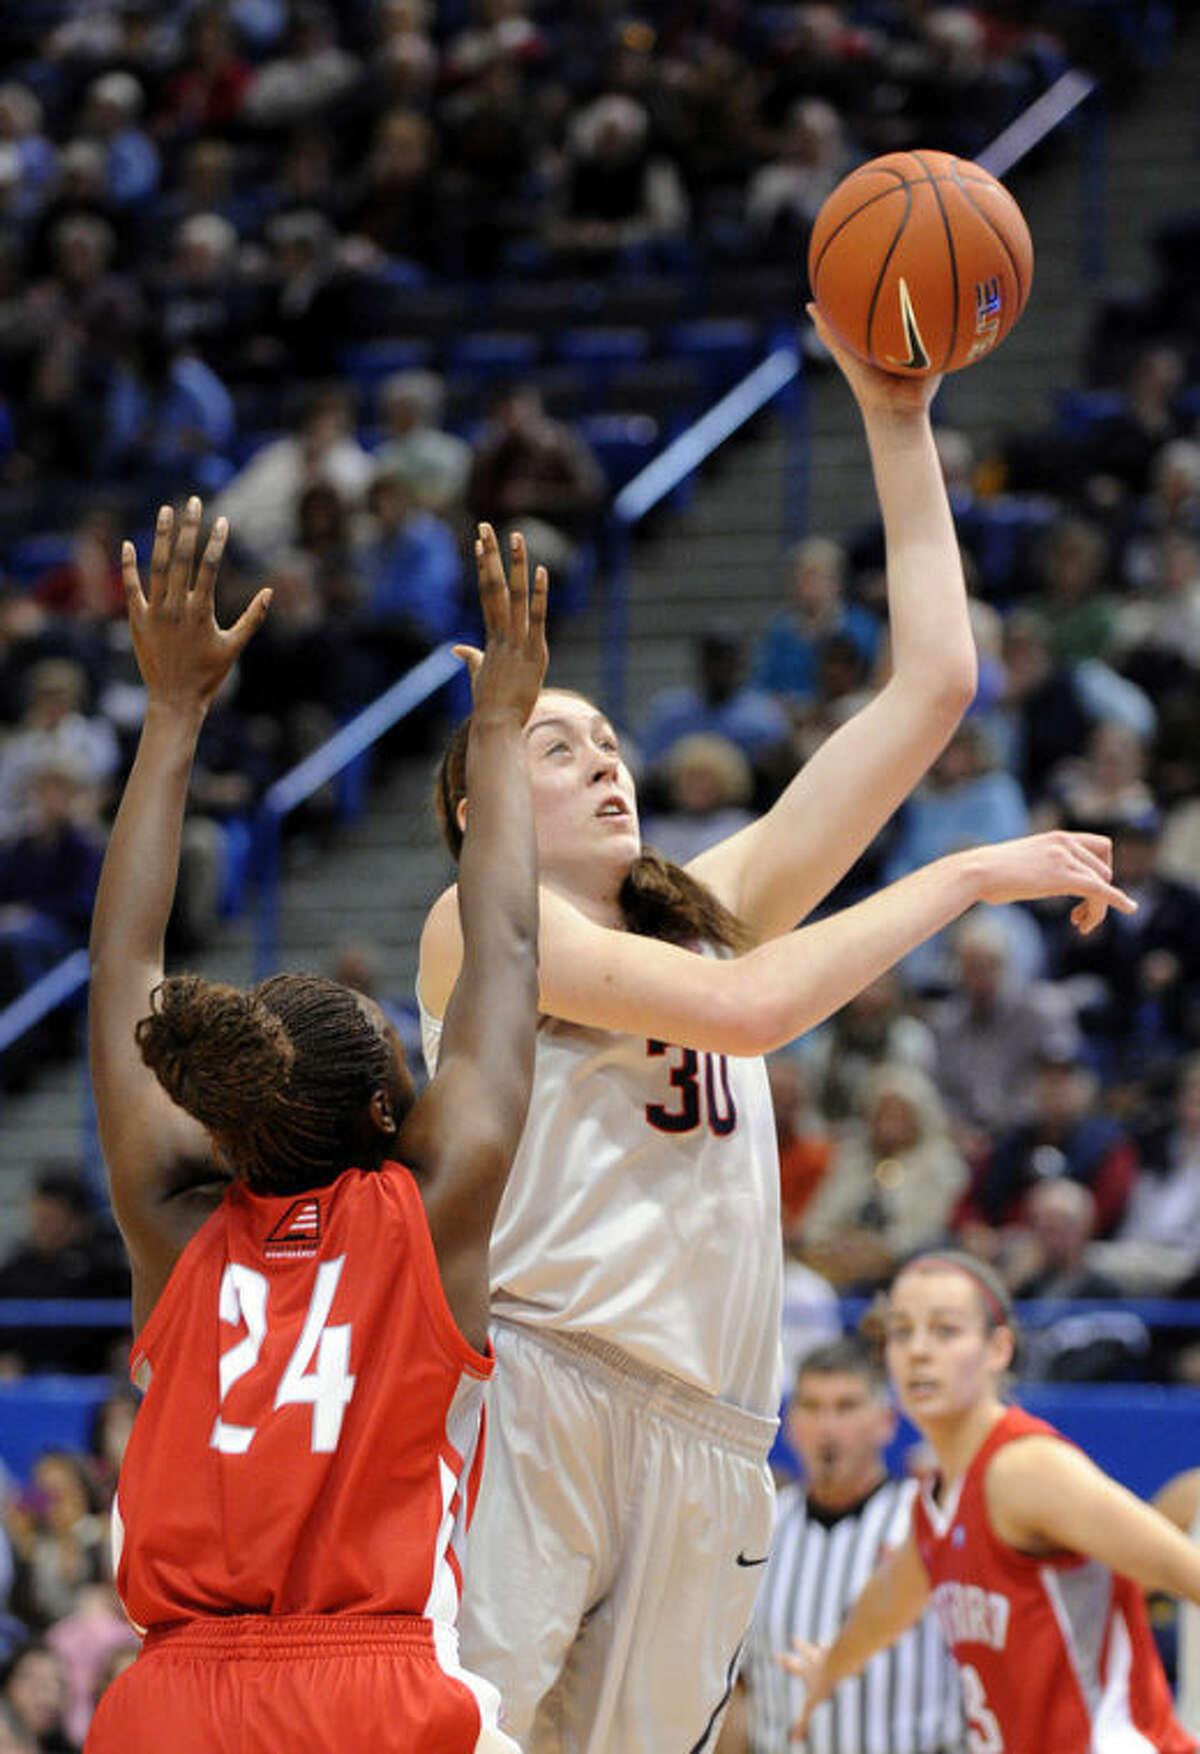 Connecticut forward Breanna Stewart (30) shoots over Hartford forward Alyssa Reaves (24) during the first half of an NCAA college basketball game in Hartford, Conn., on Saturday, Nov. 9, 2013. (AP Photo/Fred Beckham)